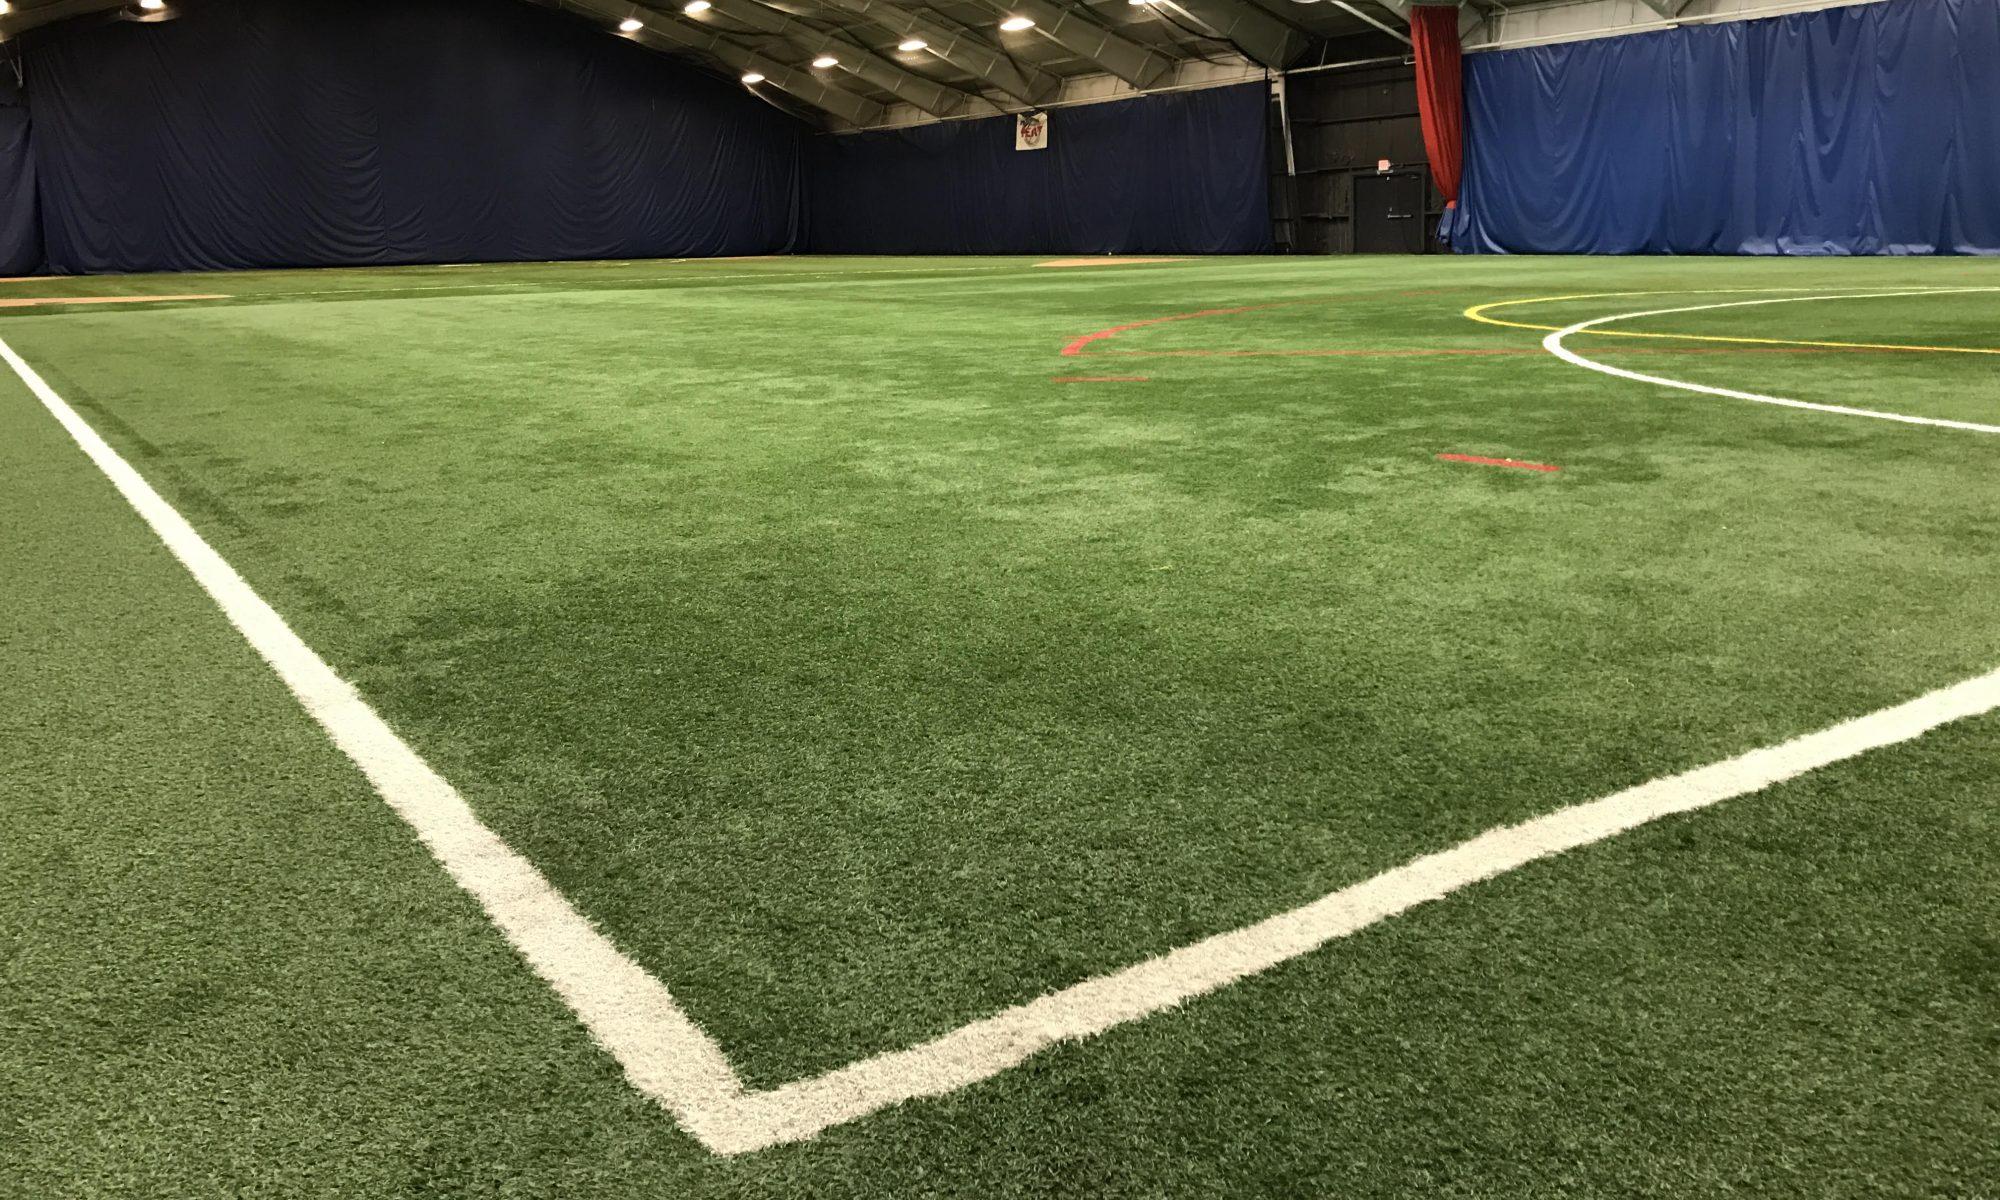 Shrewsbury Sports Center